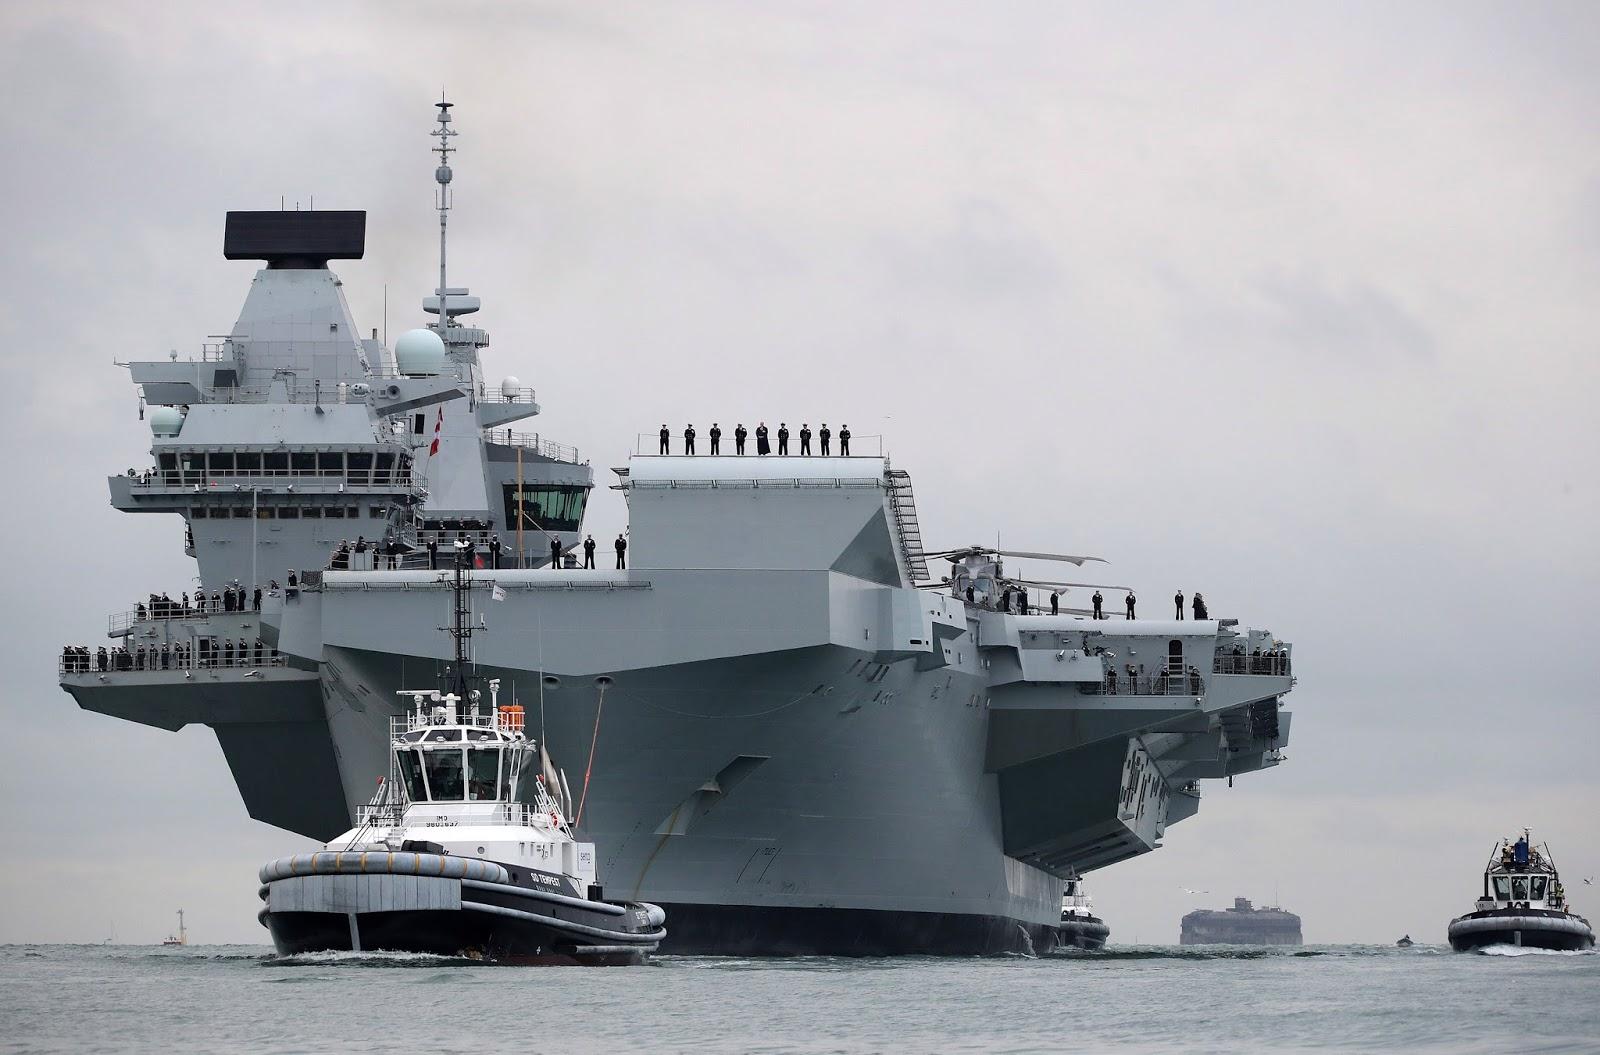 British Aircraft Carrier Queen Elizabeth HMS Queen Elizabeth ai...